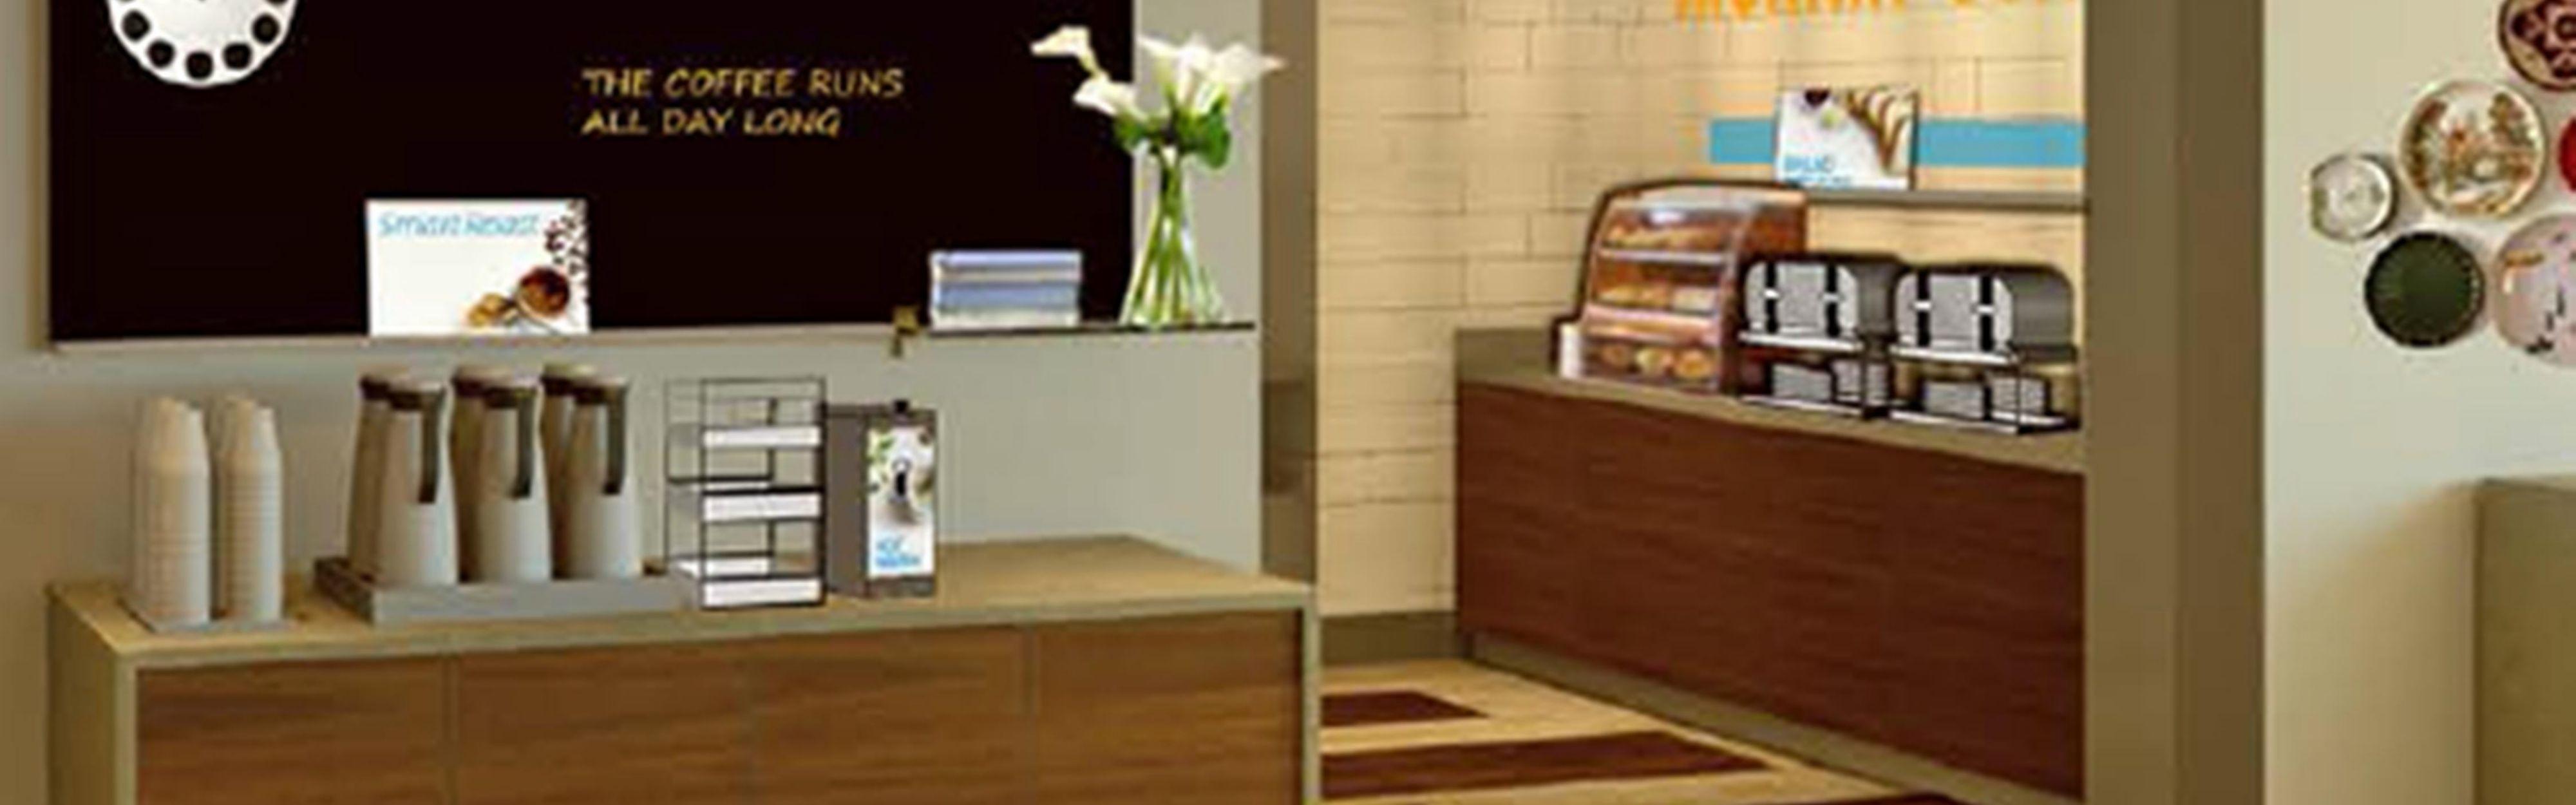 Holiday Inn Express & Suites Camarillo image 2